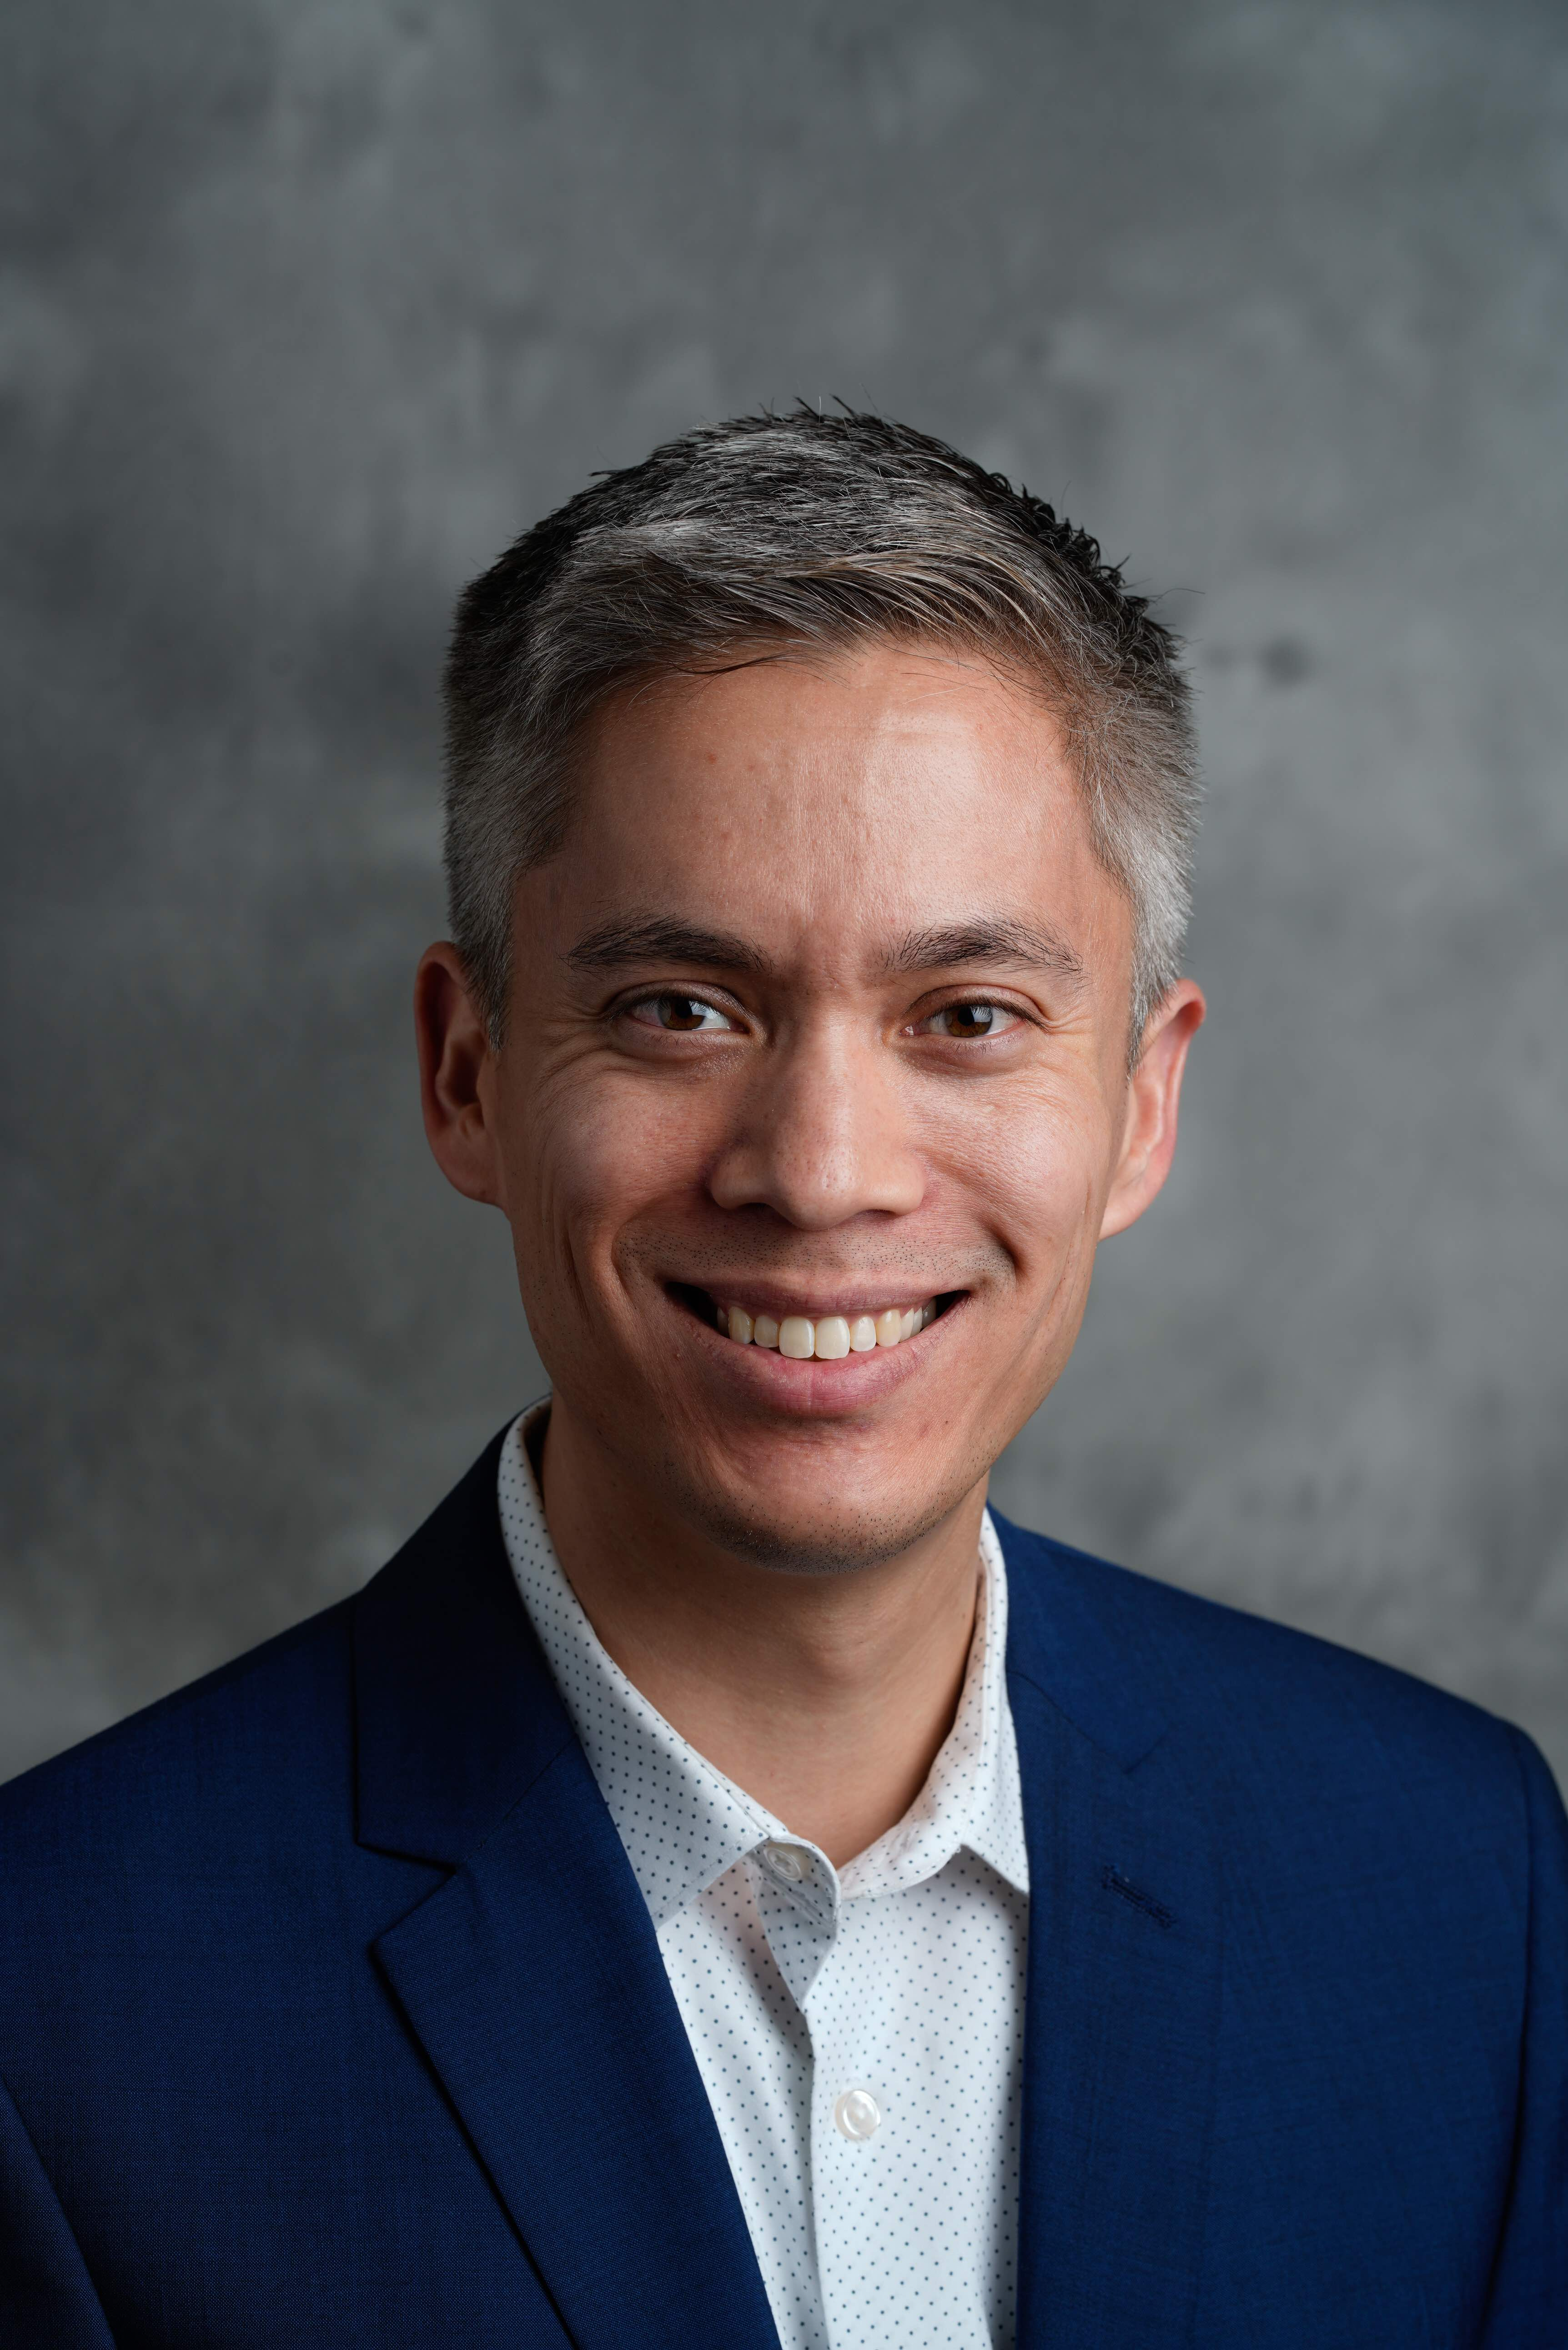 Andrew P. Landstrom, M.D., Ph.D.